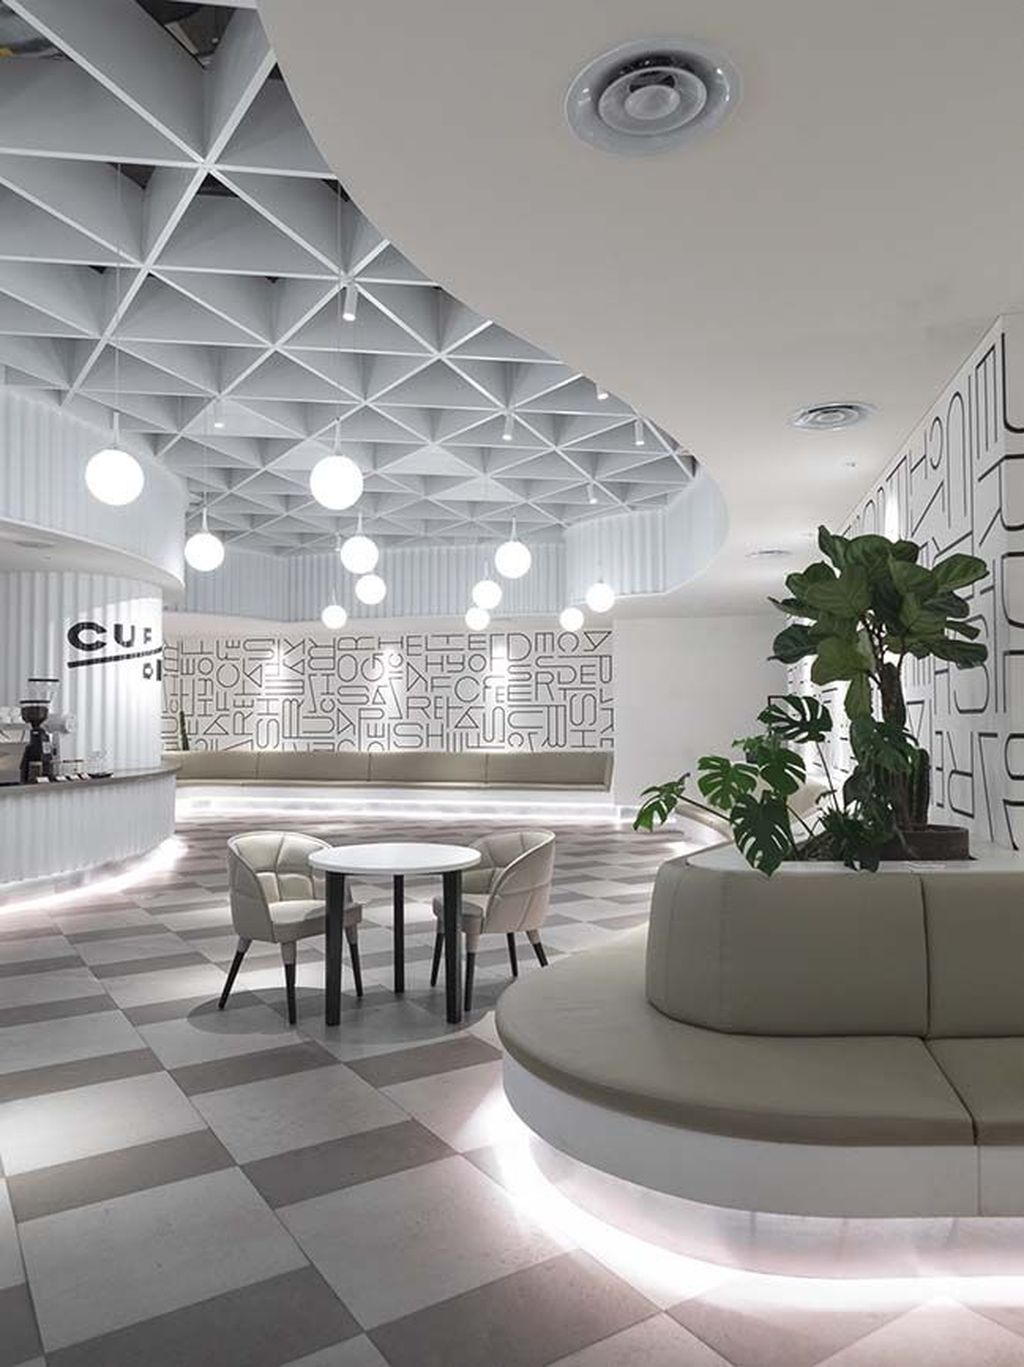 Beautiful Contemporary Interior Design Ideas You Never Seen Before 23